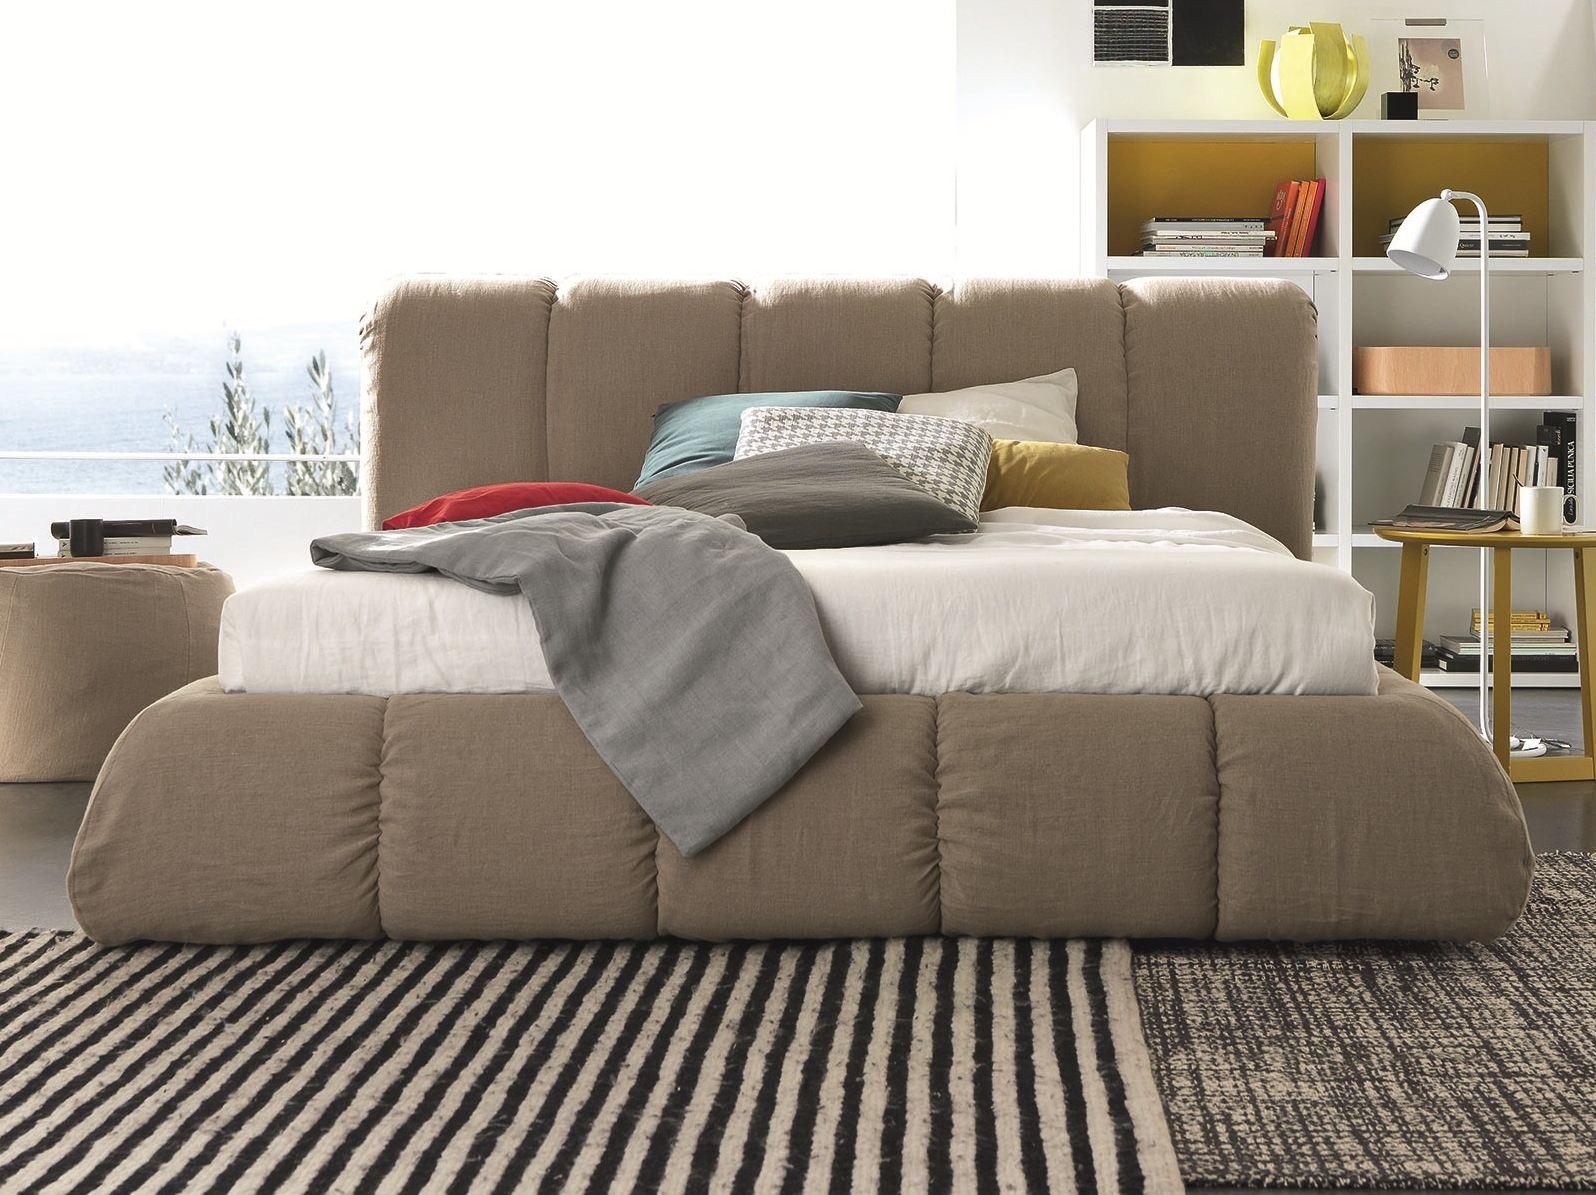 lit sharpei lit contemporain ultra moelleux. Black Bedroom Furniture Sets. Home Design Ideas